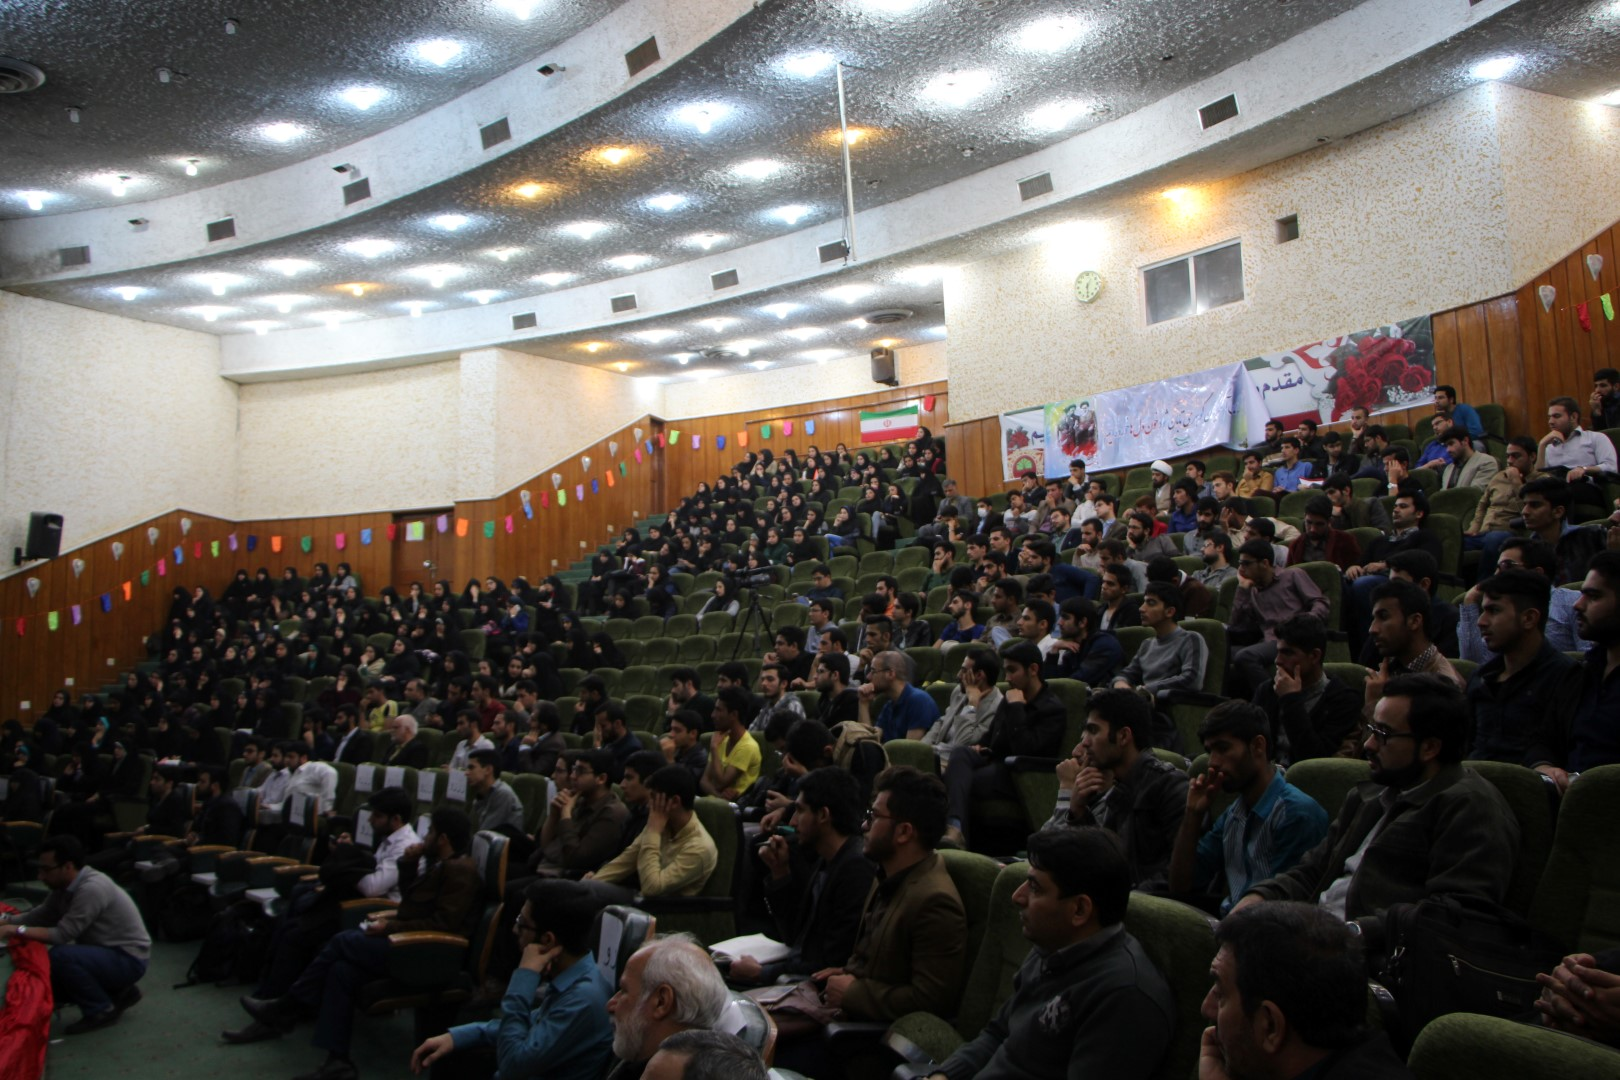 IMG 5194 گزارش تصویری؛ سخنرانی استاد حسن عباسی با موضوع از چوئن لای تا سیاست درهای باز